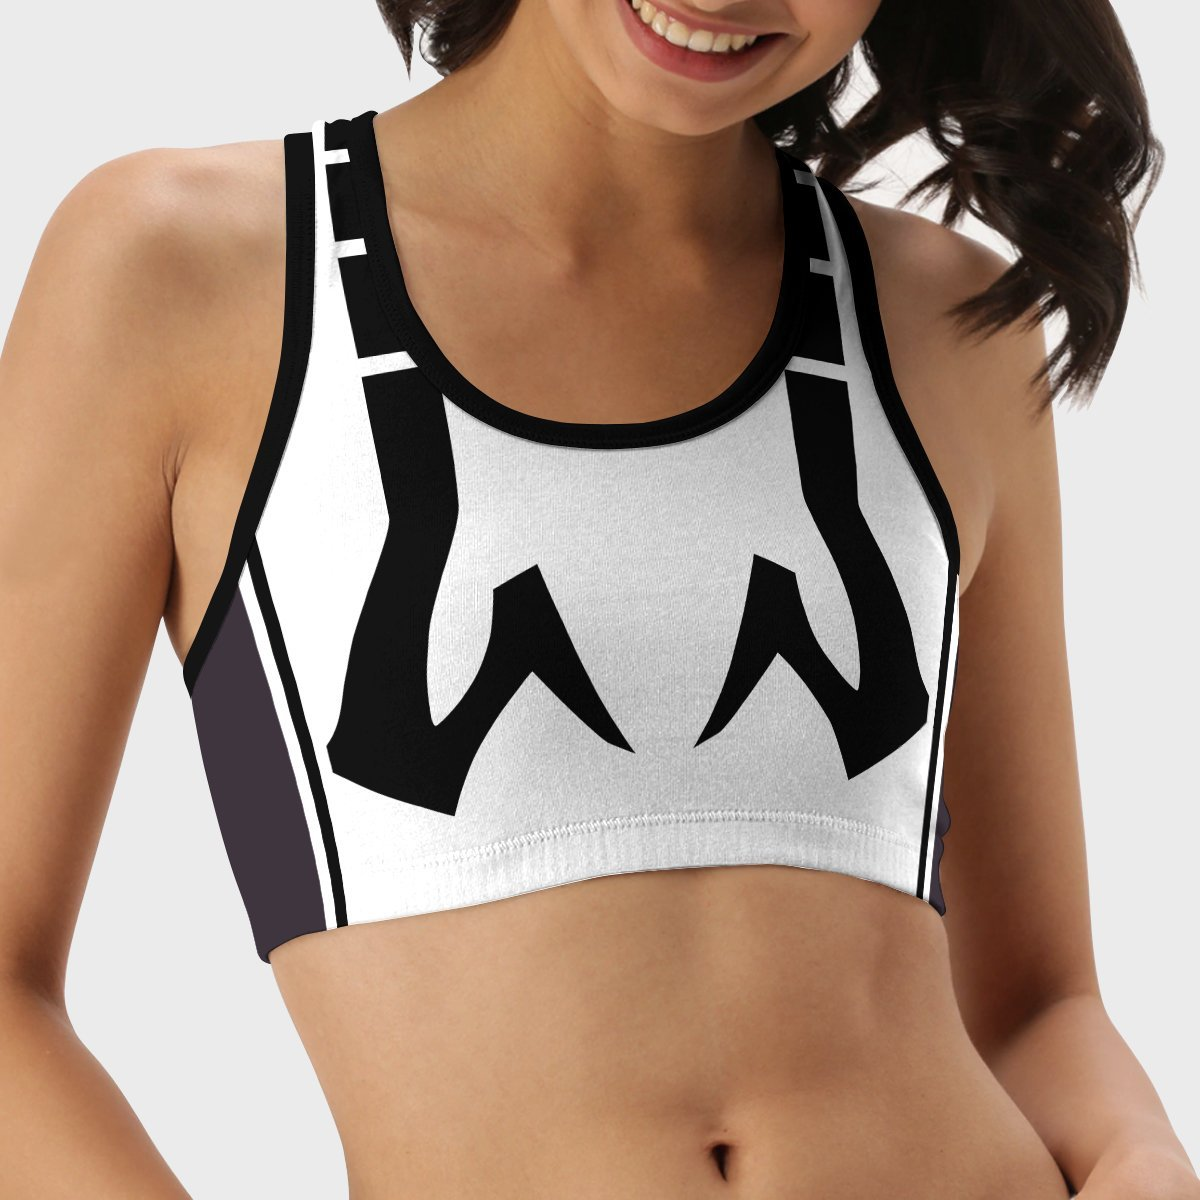 legend sukuna active wear set 683381 - Anime Swimsuits